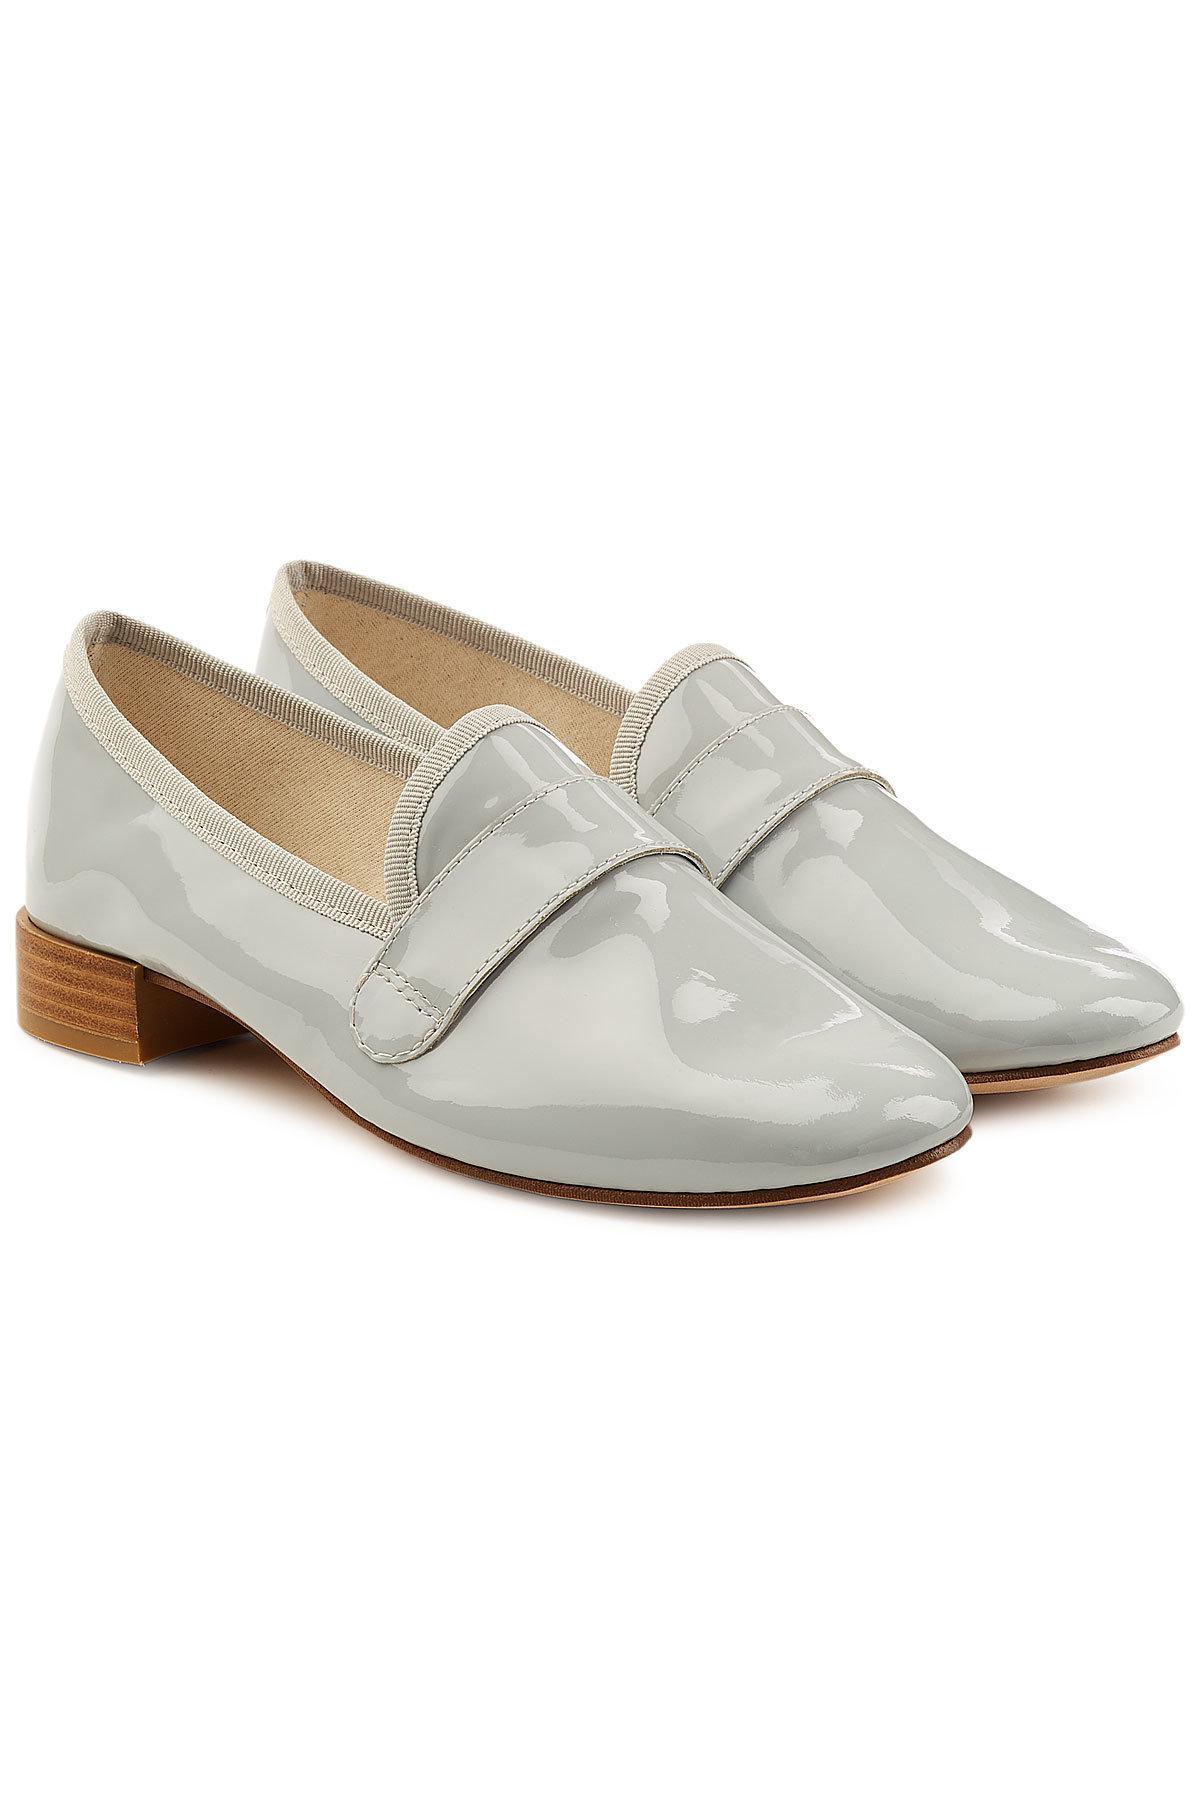 4dfa1d85248 Repetto. Women s Michael Patent Leather Loafers